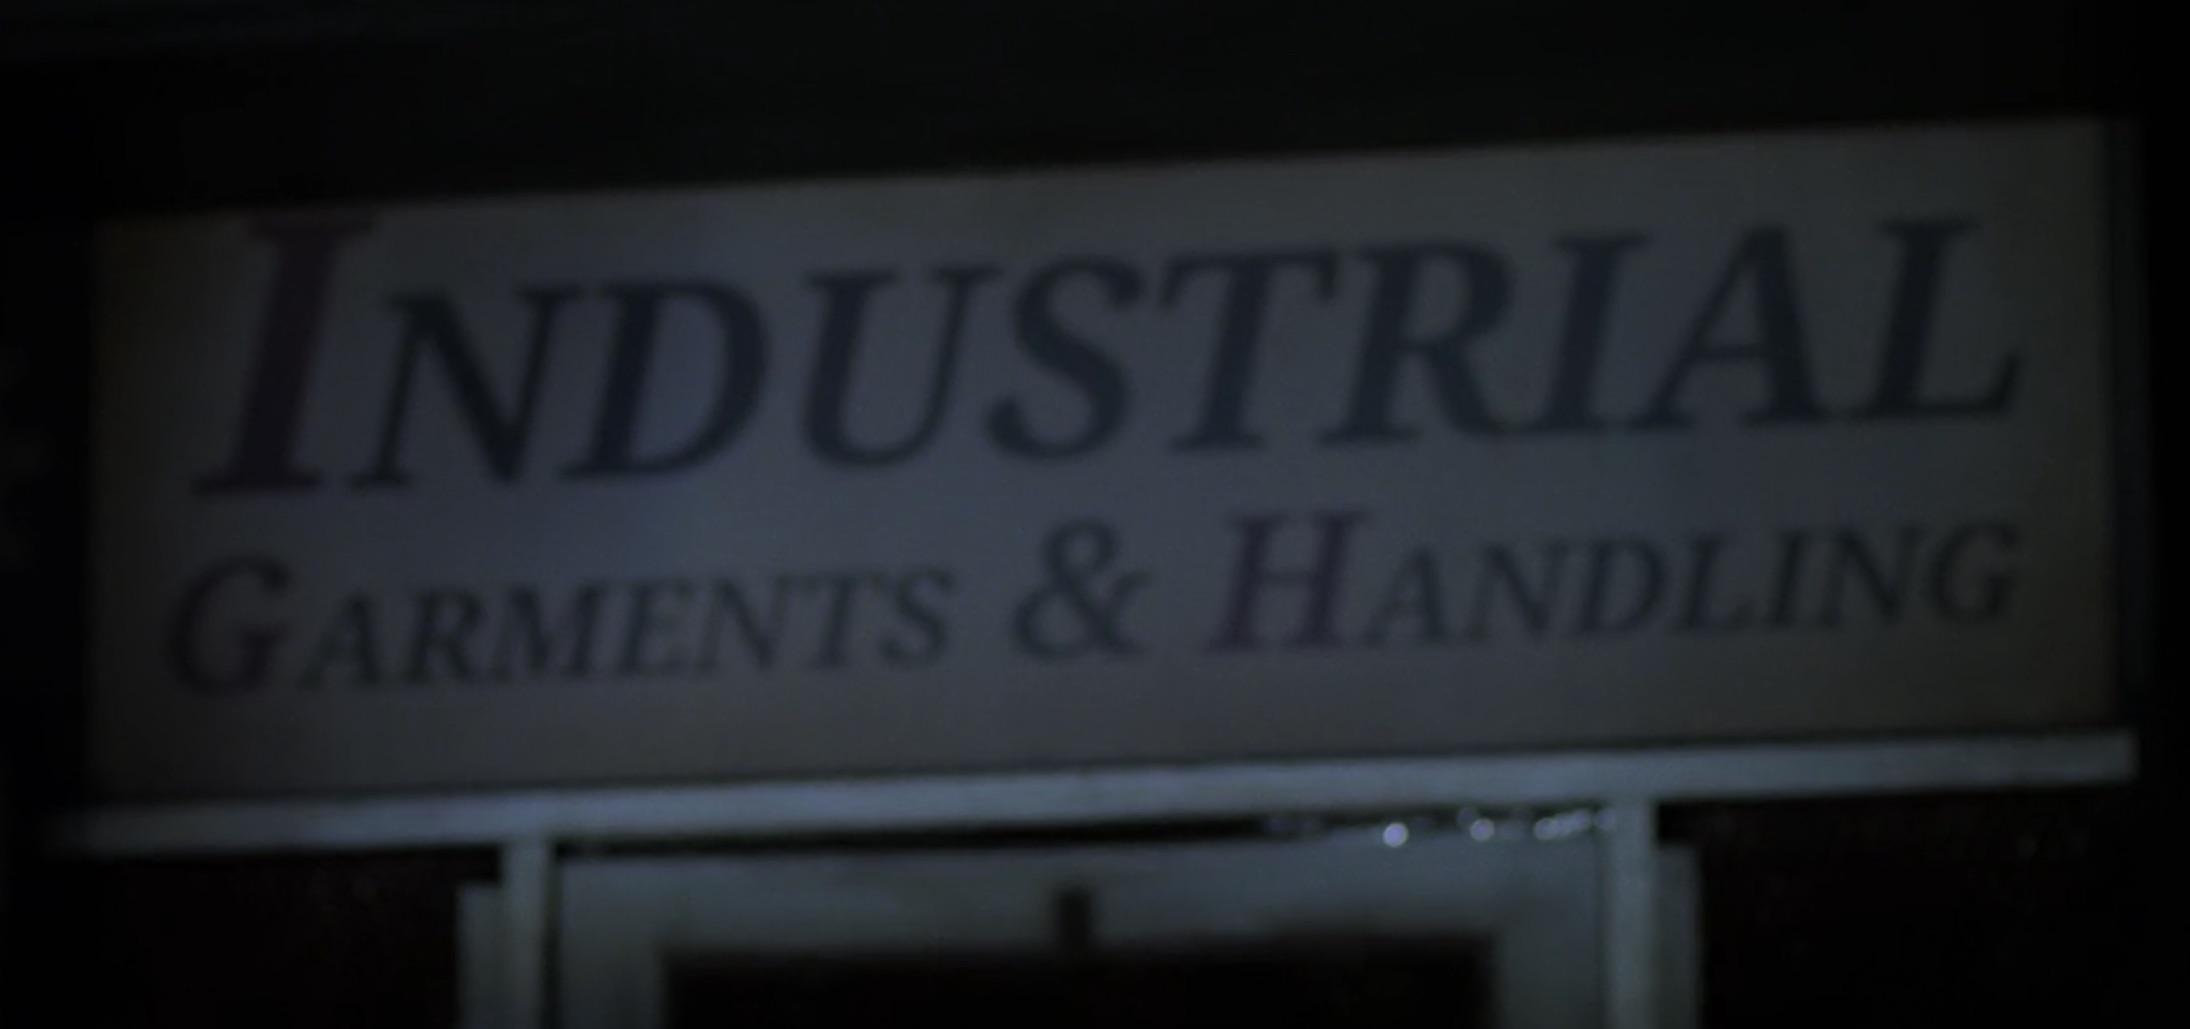 Industrial Garments & Handling Clinic/Gallery